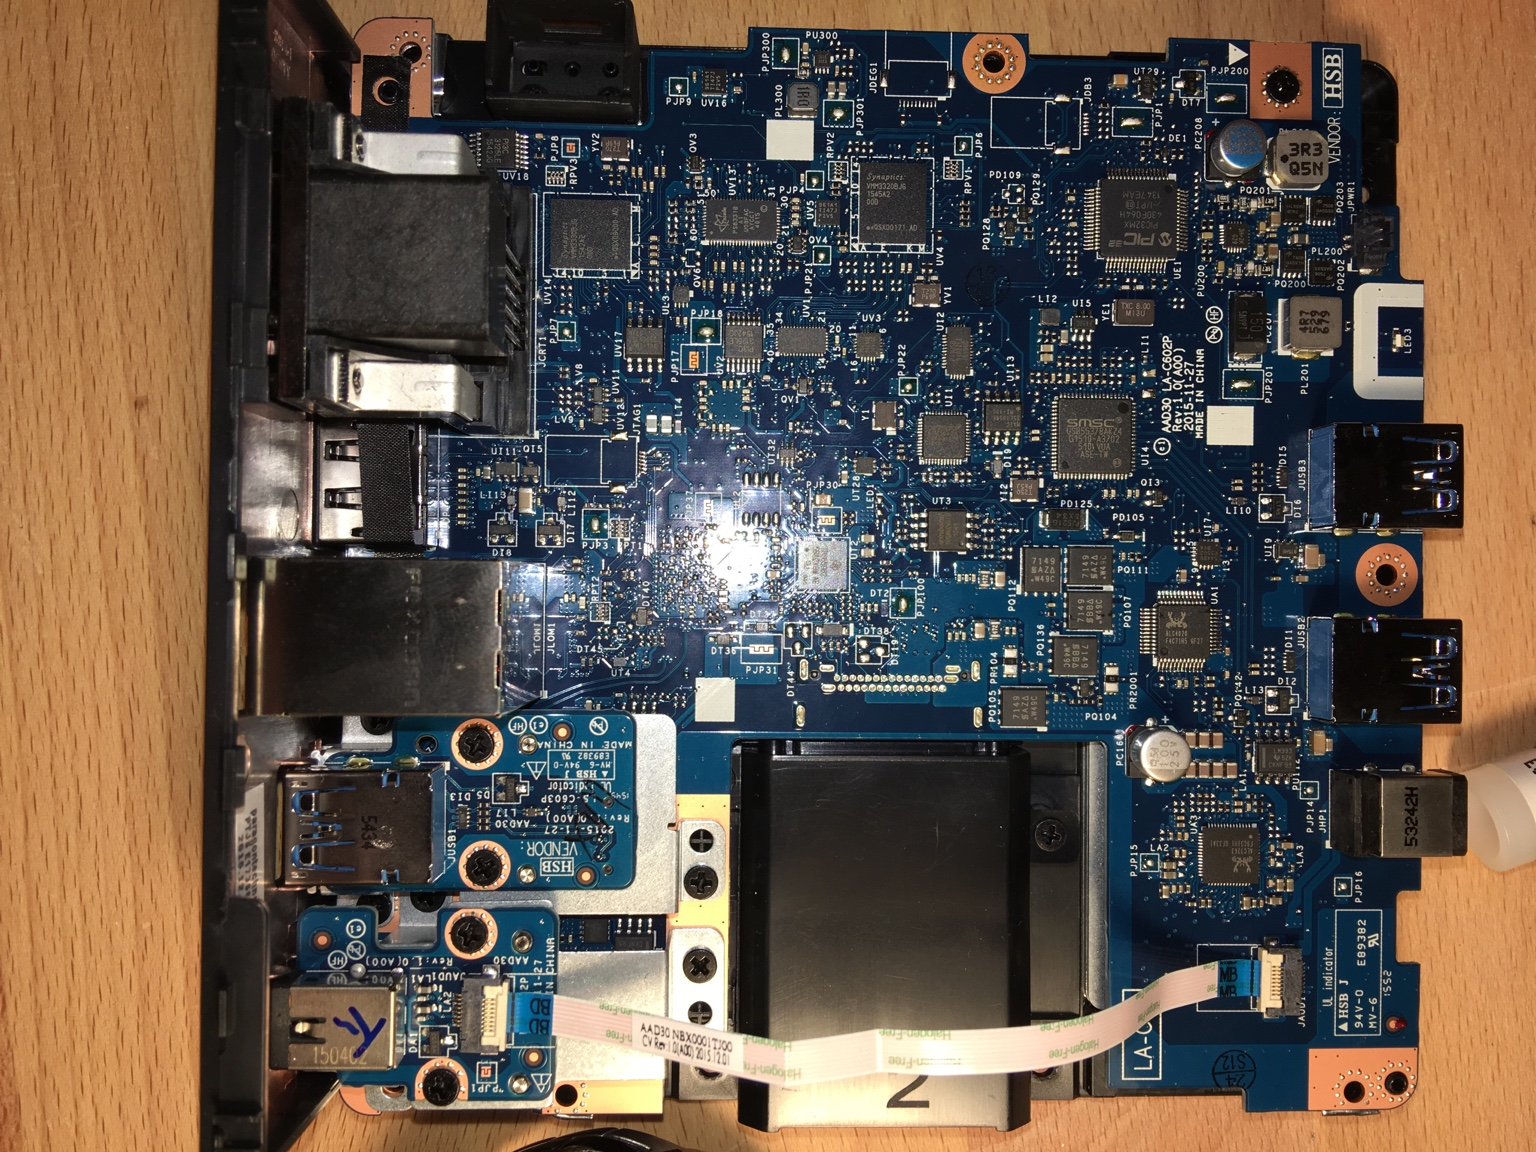 Dell Thunderbolt dock TB15 overheating? | NotebookReview